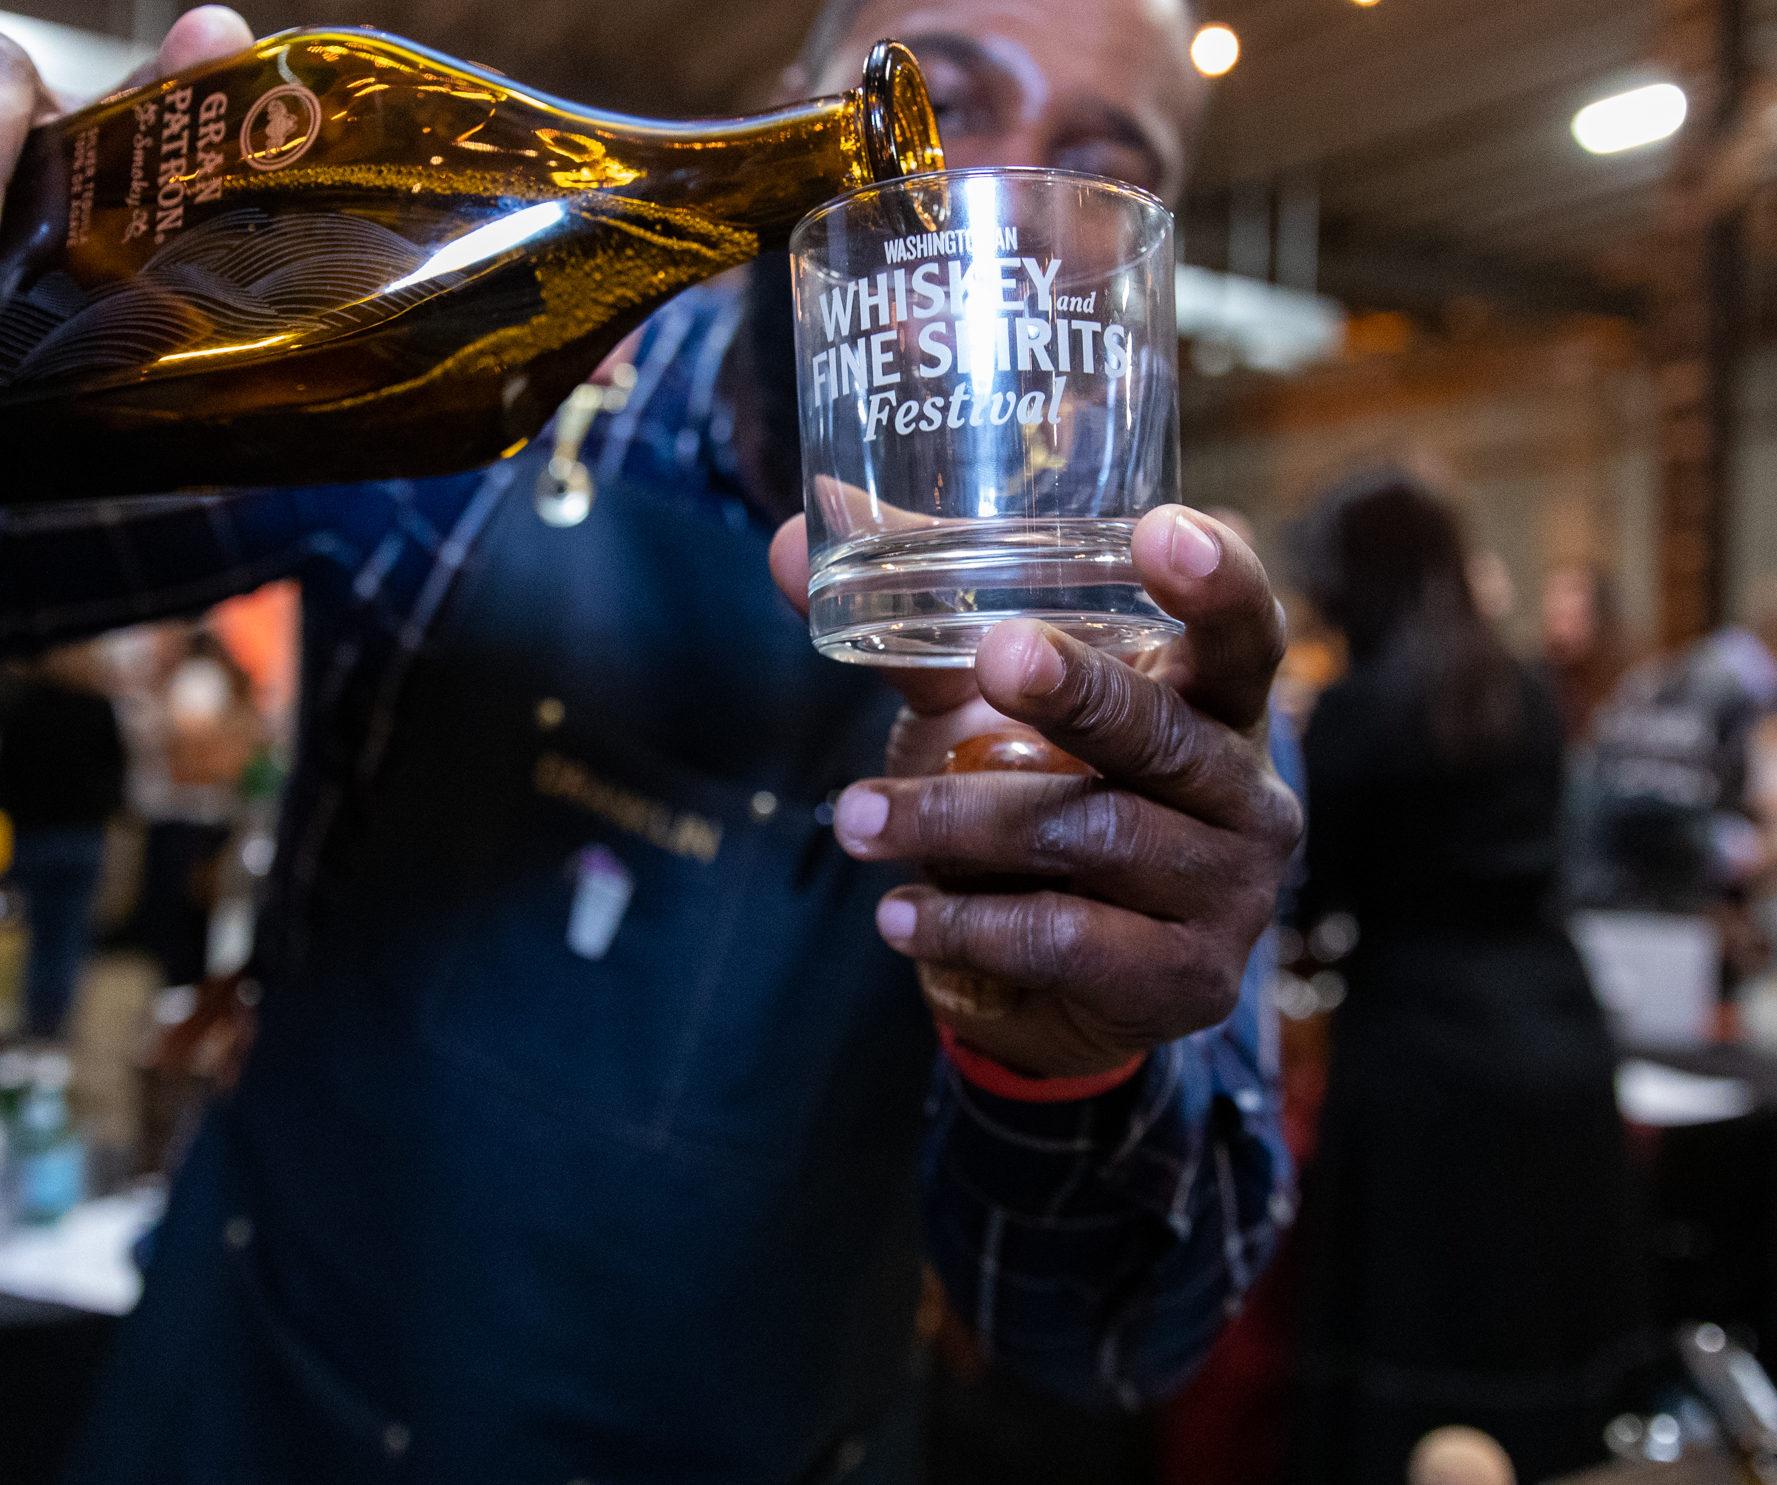 Photos From Washingtonian's 8th Annual Whiskey & Fine Spirits Festival